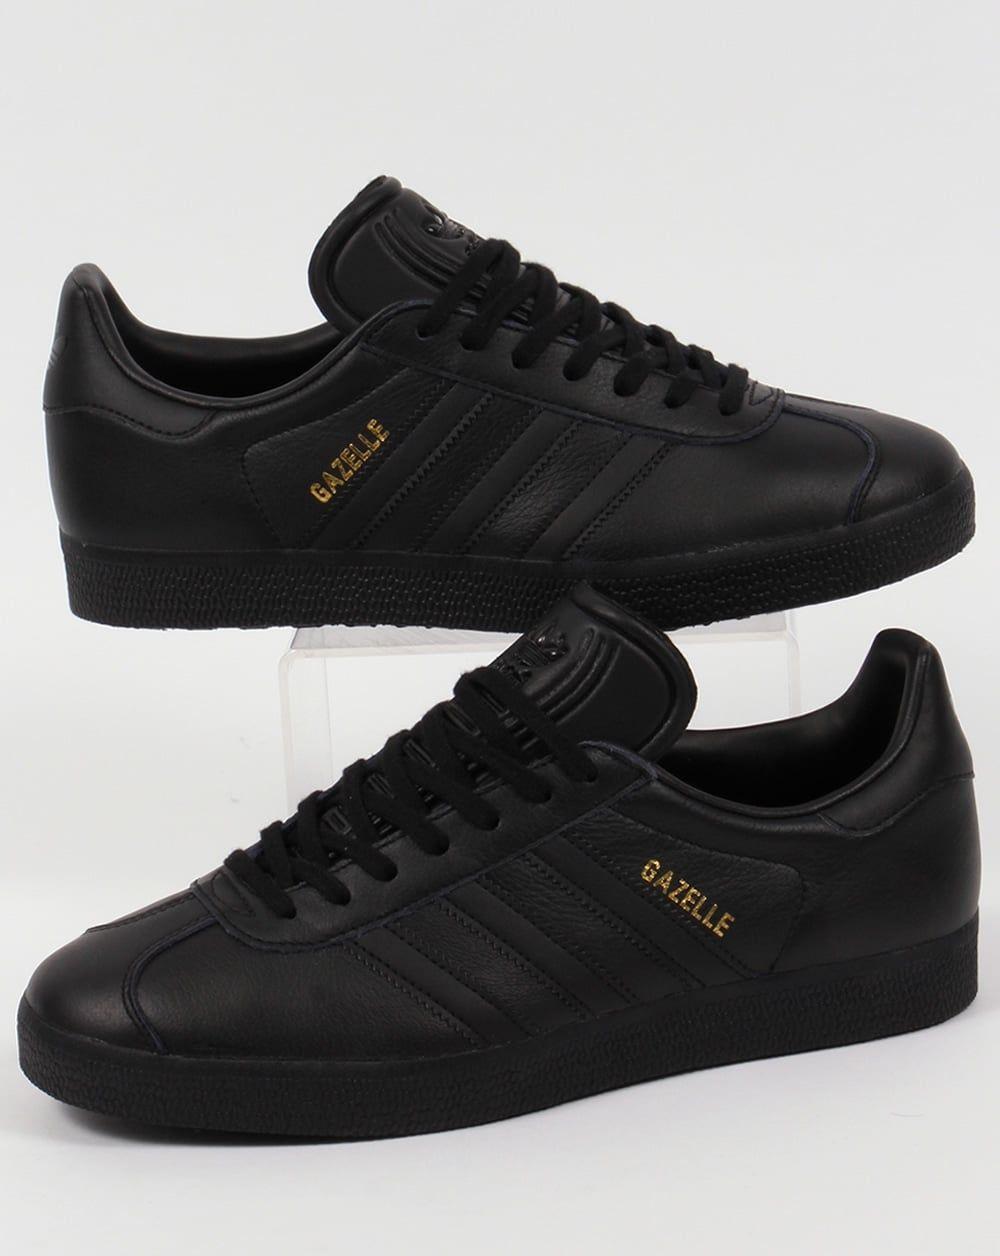 Retirada más lejos Alpinista  Adidas Gazelle Leather Trainers Triple Black | Adidas gazelle, Leather  trainers, Black leather trainers